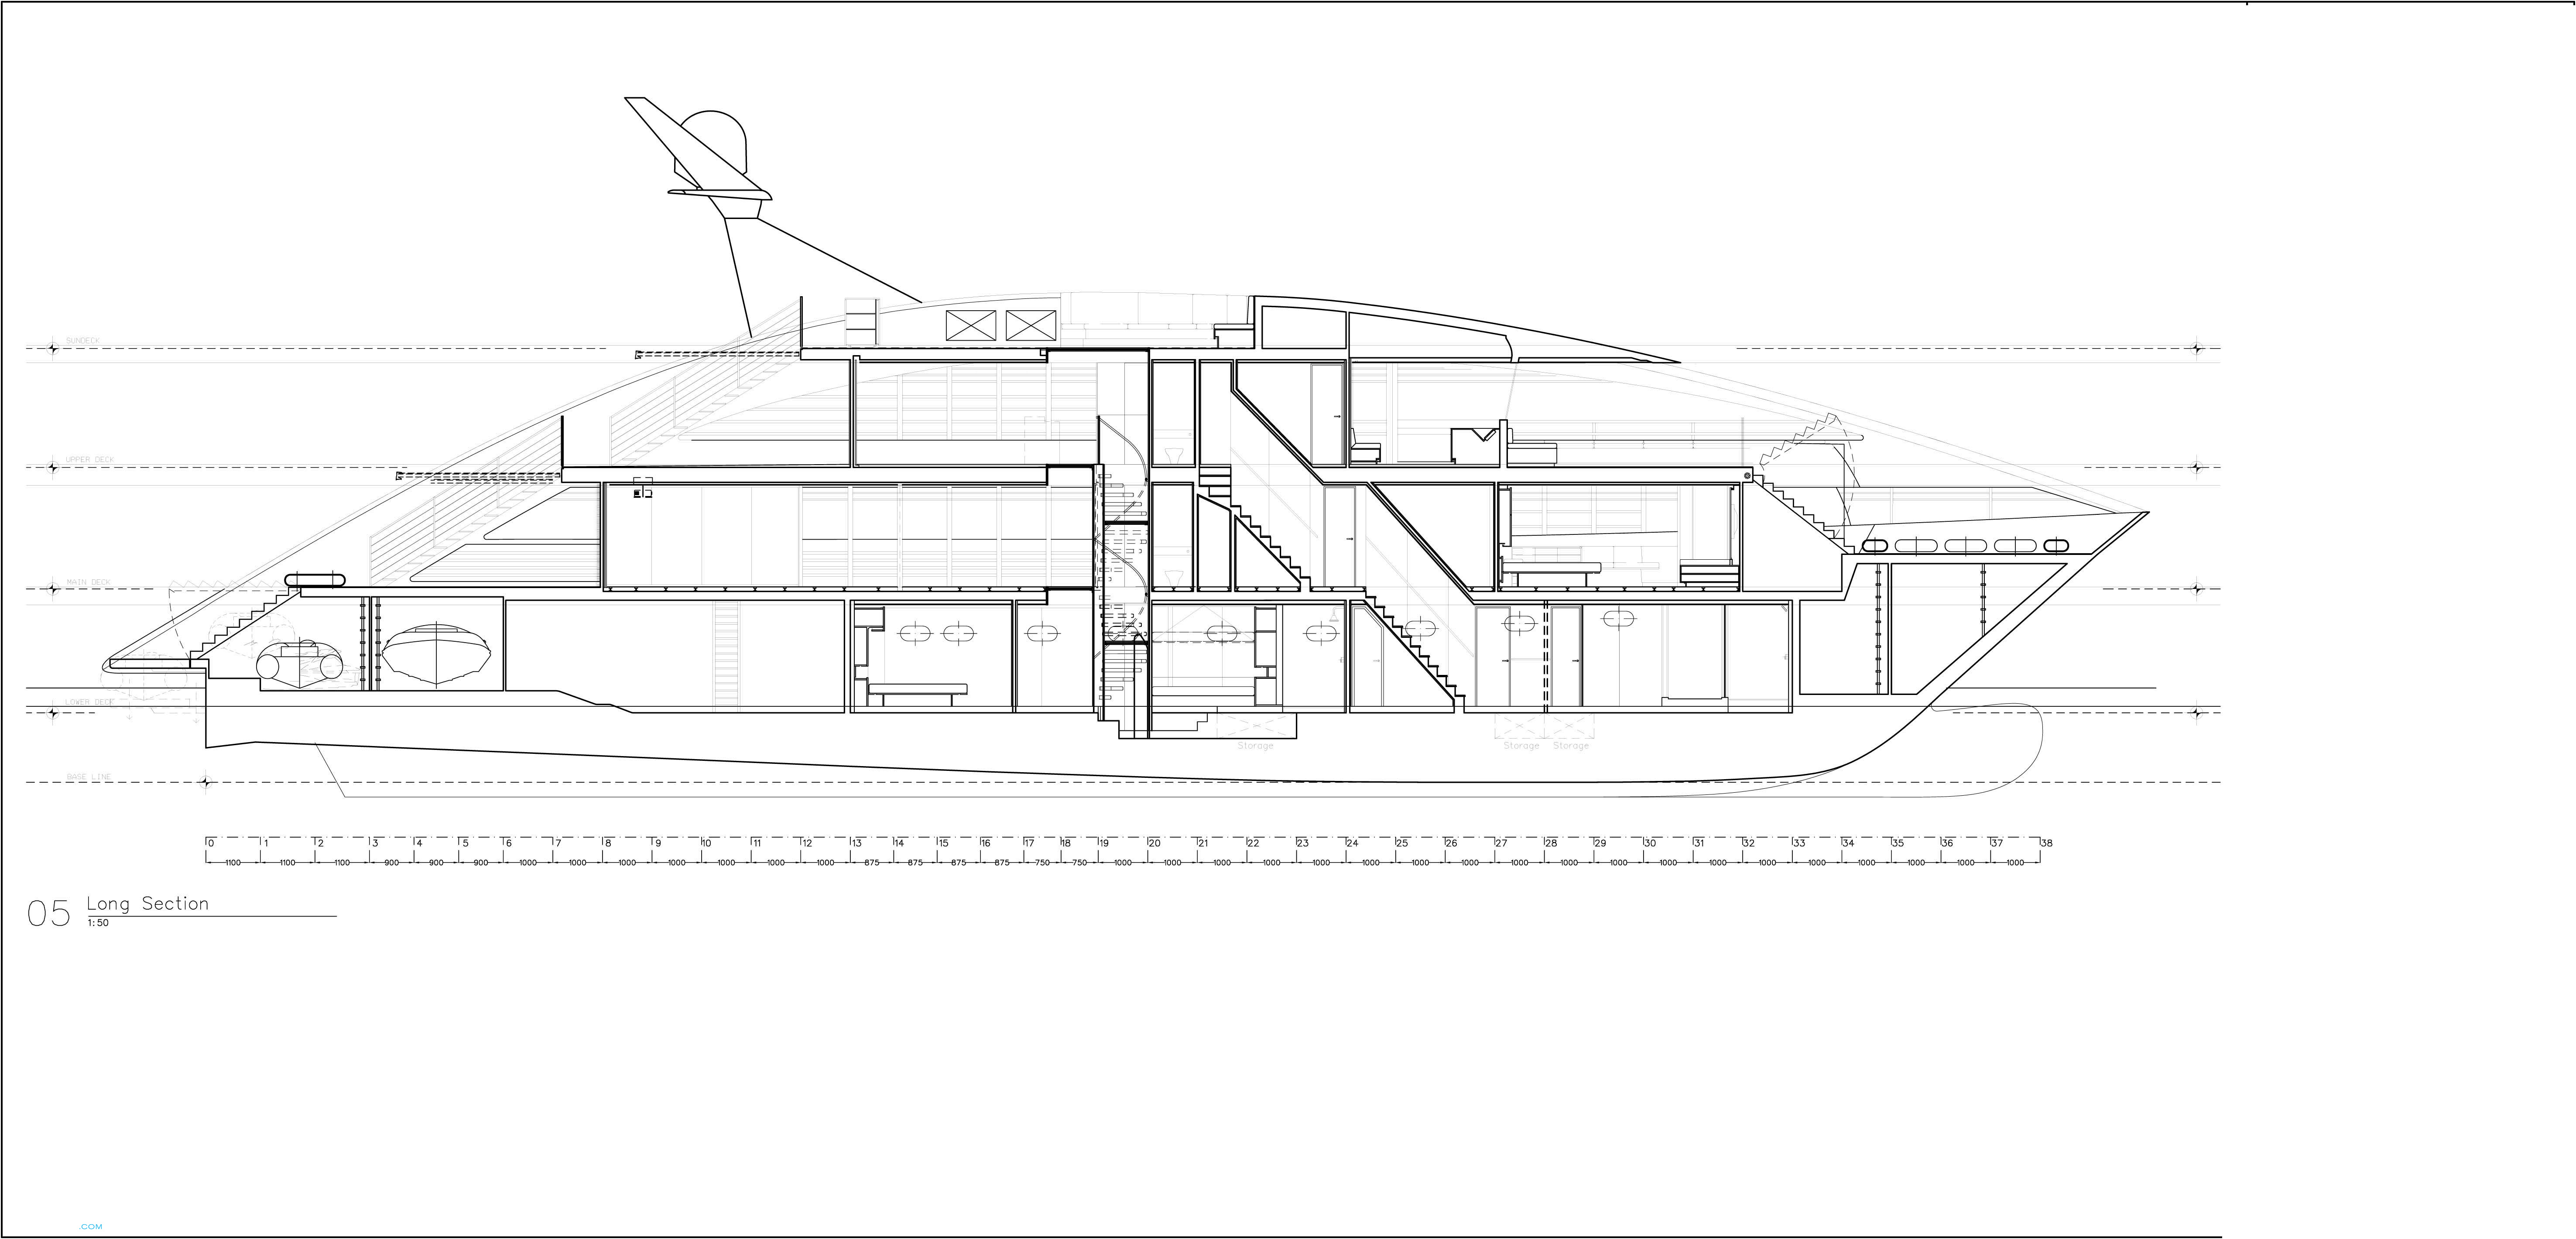 Ocean pearl layout rodriquez yachts motor superyachts com